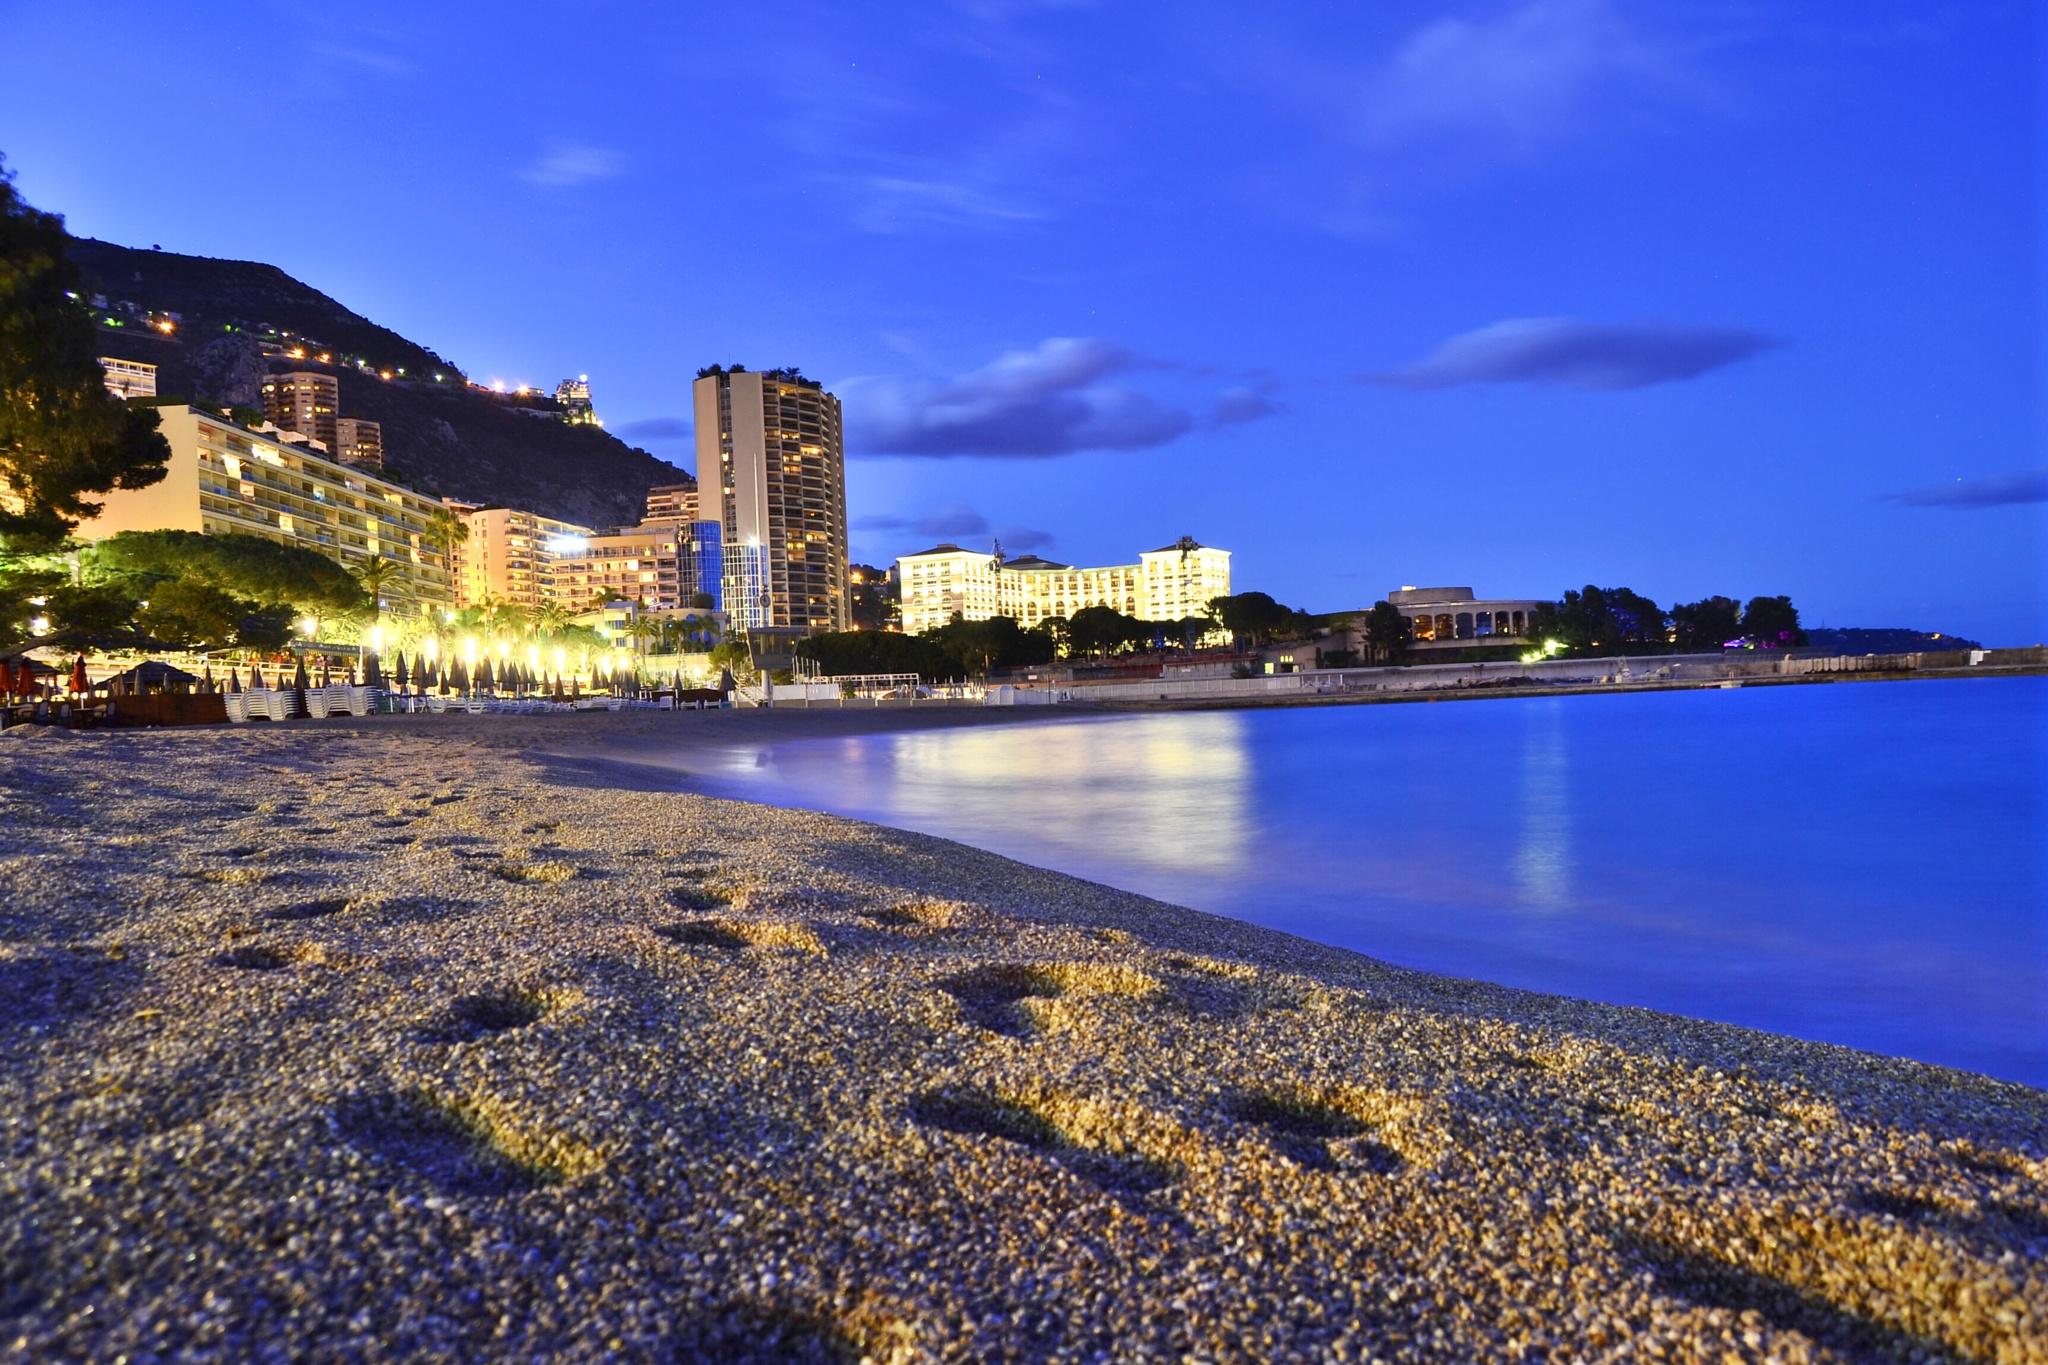 Monaco beach shortly after sunset by Aleksey Zaharinov